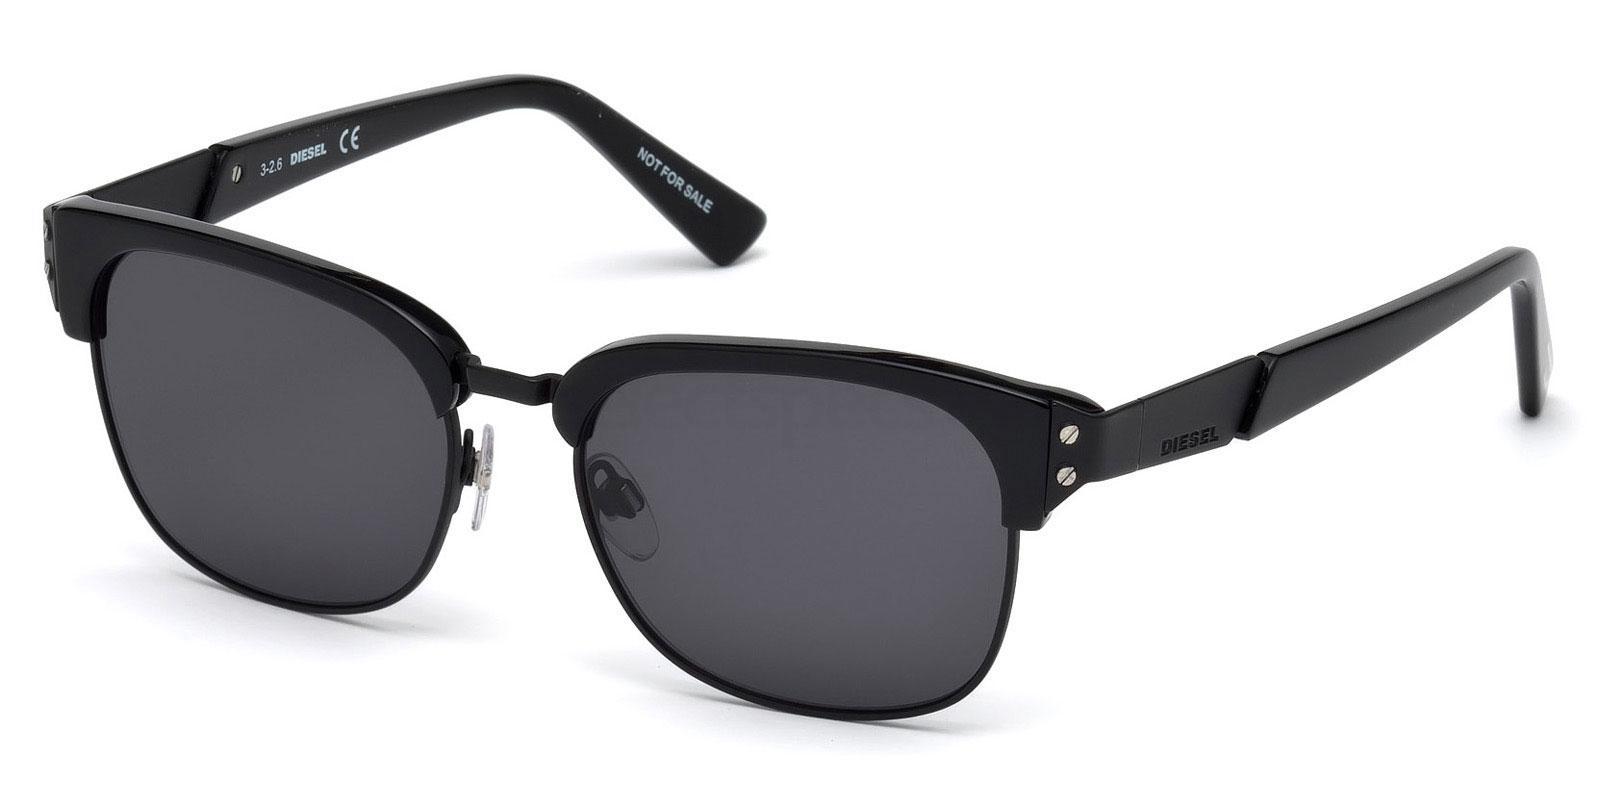 01A DL0235 Sunglasses, Diesel